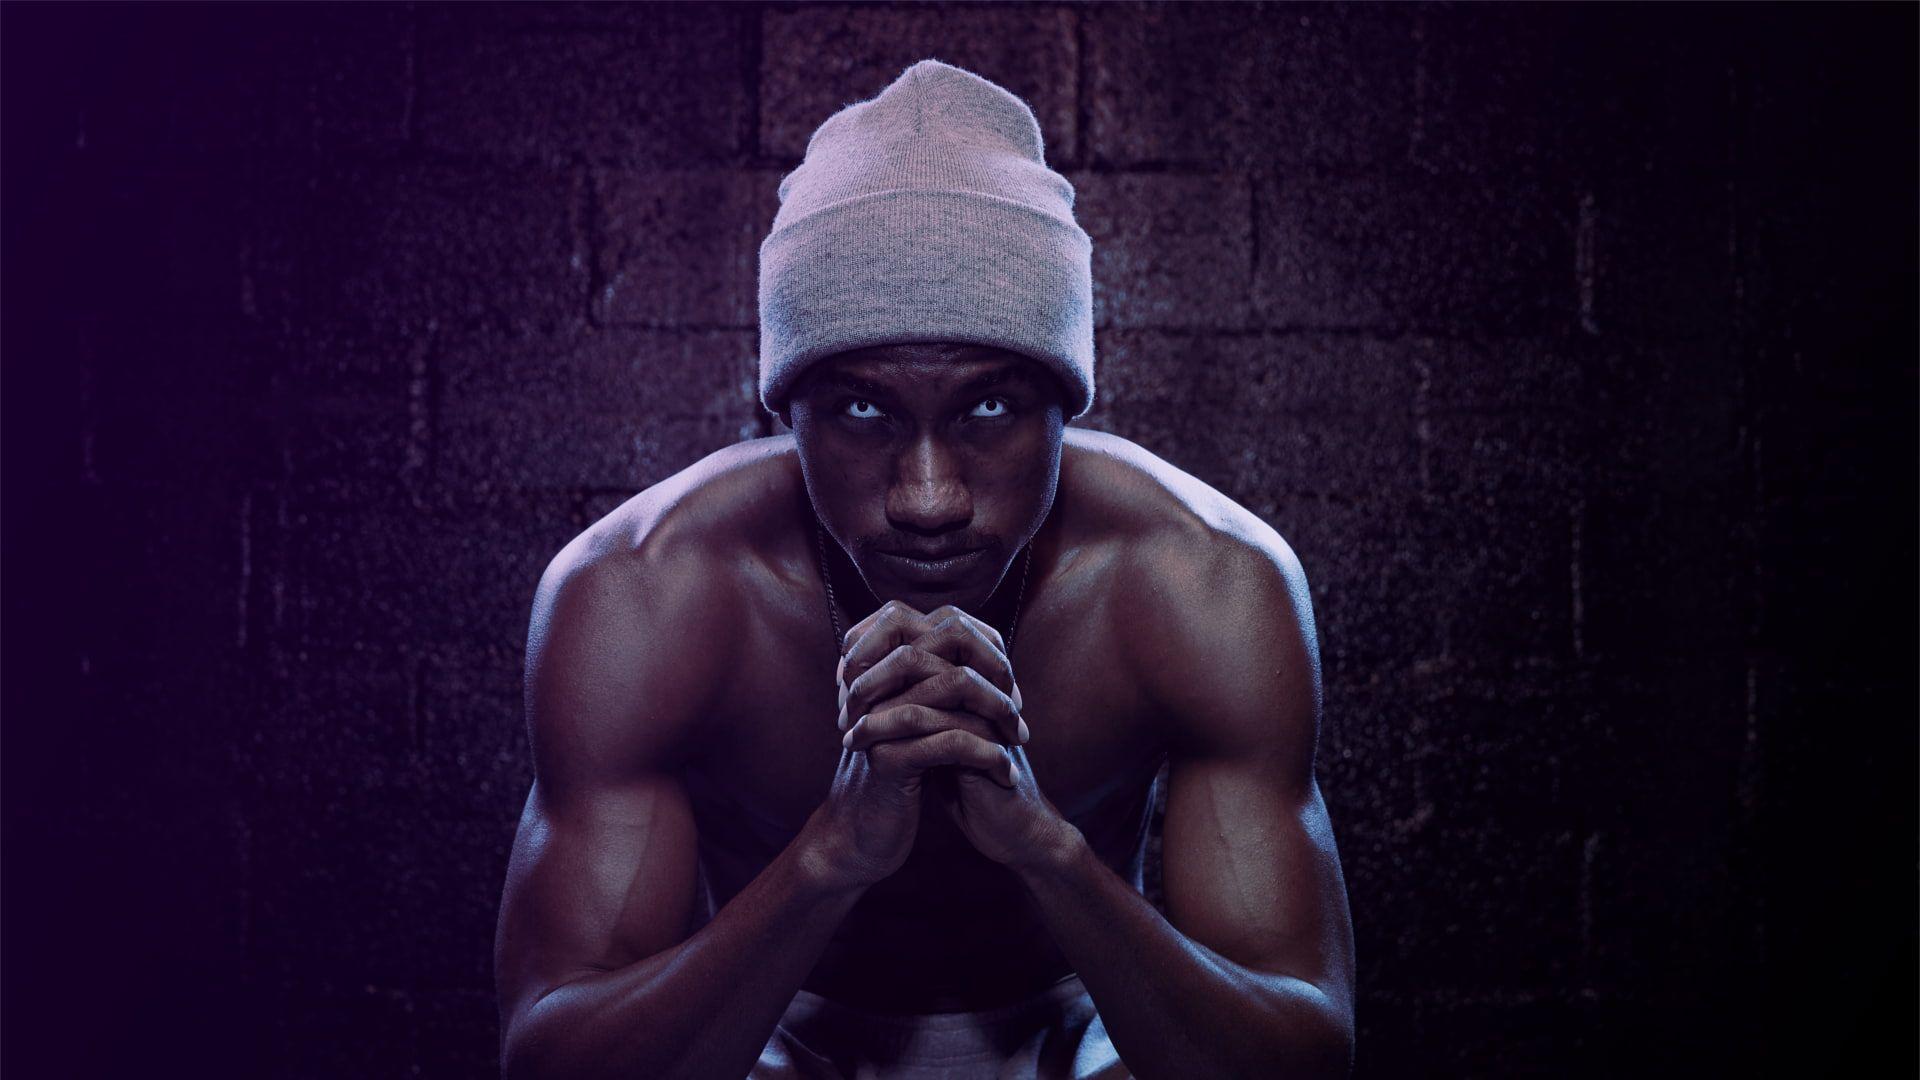 Hopsin Rapper 1080p Wallpaper Hdwallpaper Desktop Hopsin Joyner Lucas Rapper